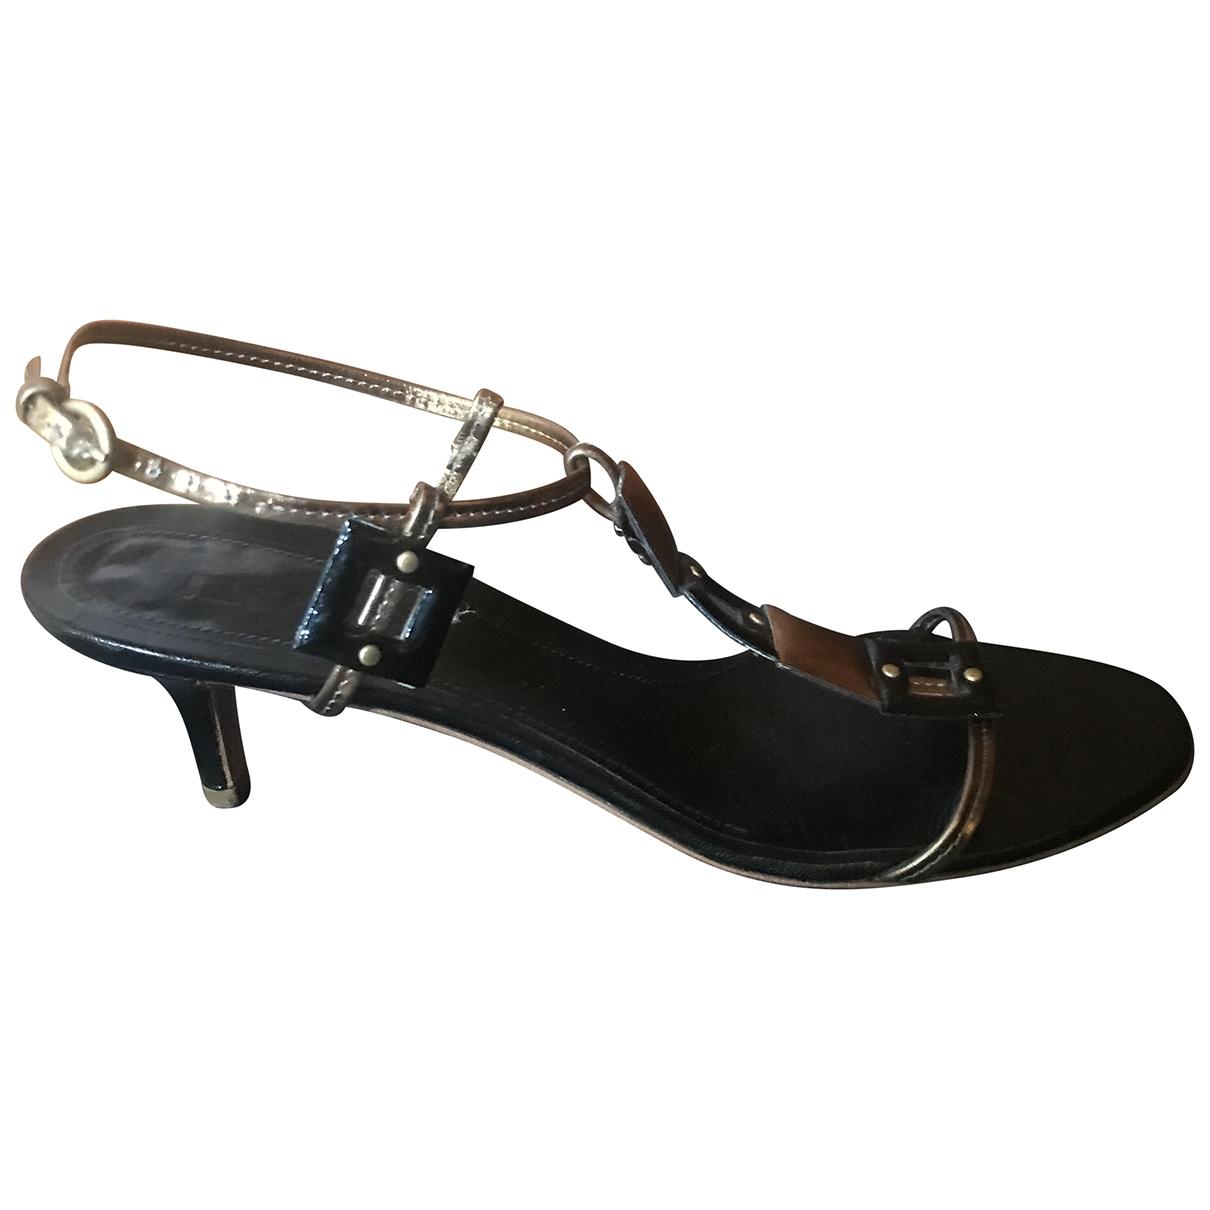 Jil Sander \N Black Patent leather Sandals for Women 39 EU